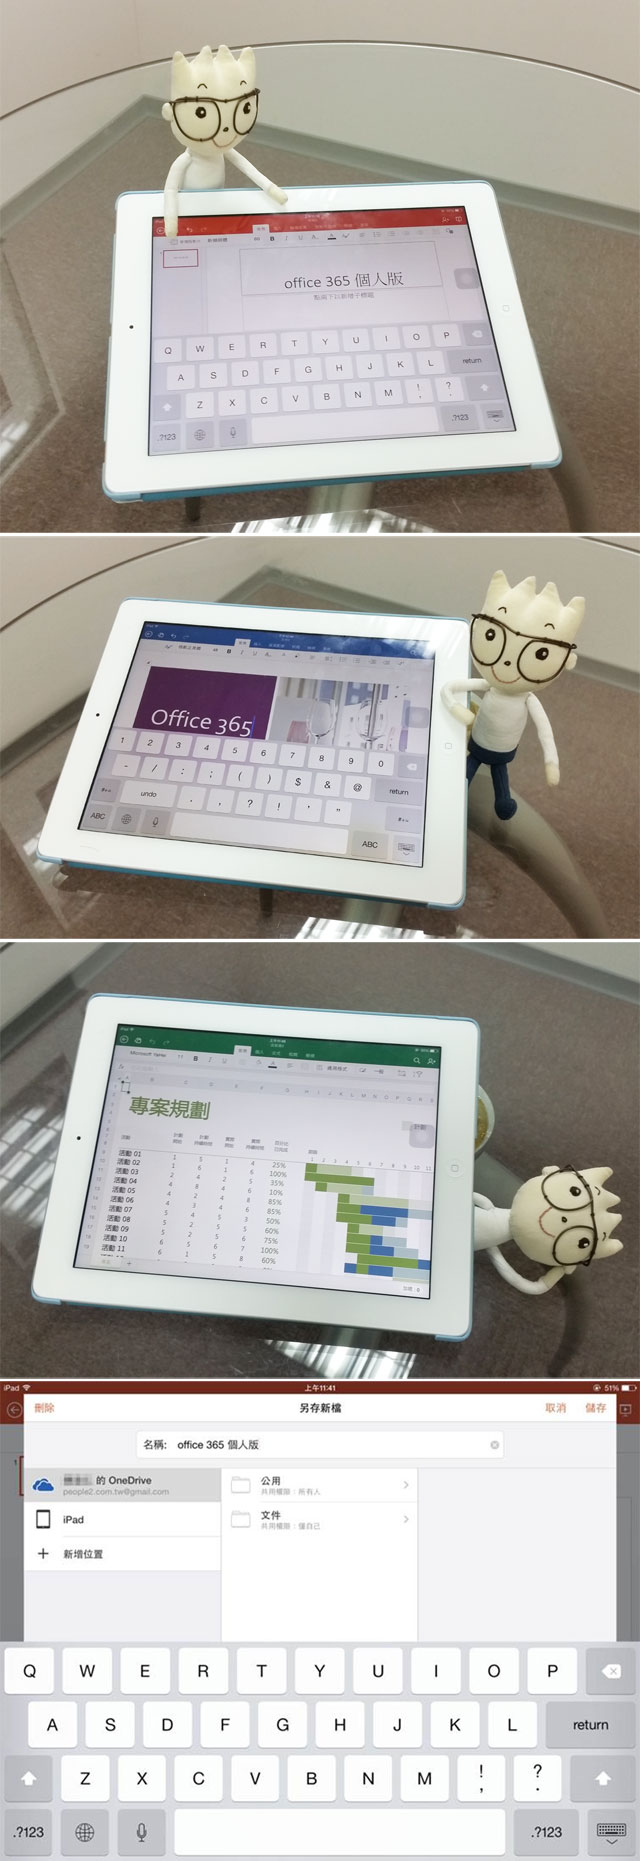 MicrosoftOffice365個人版MicrosoftOffice365微軟OneDrive電腦Windows平板iPad手機Mac人2People2